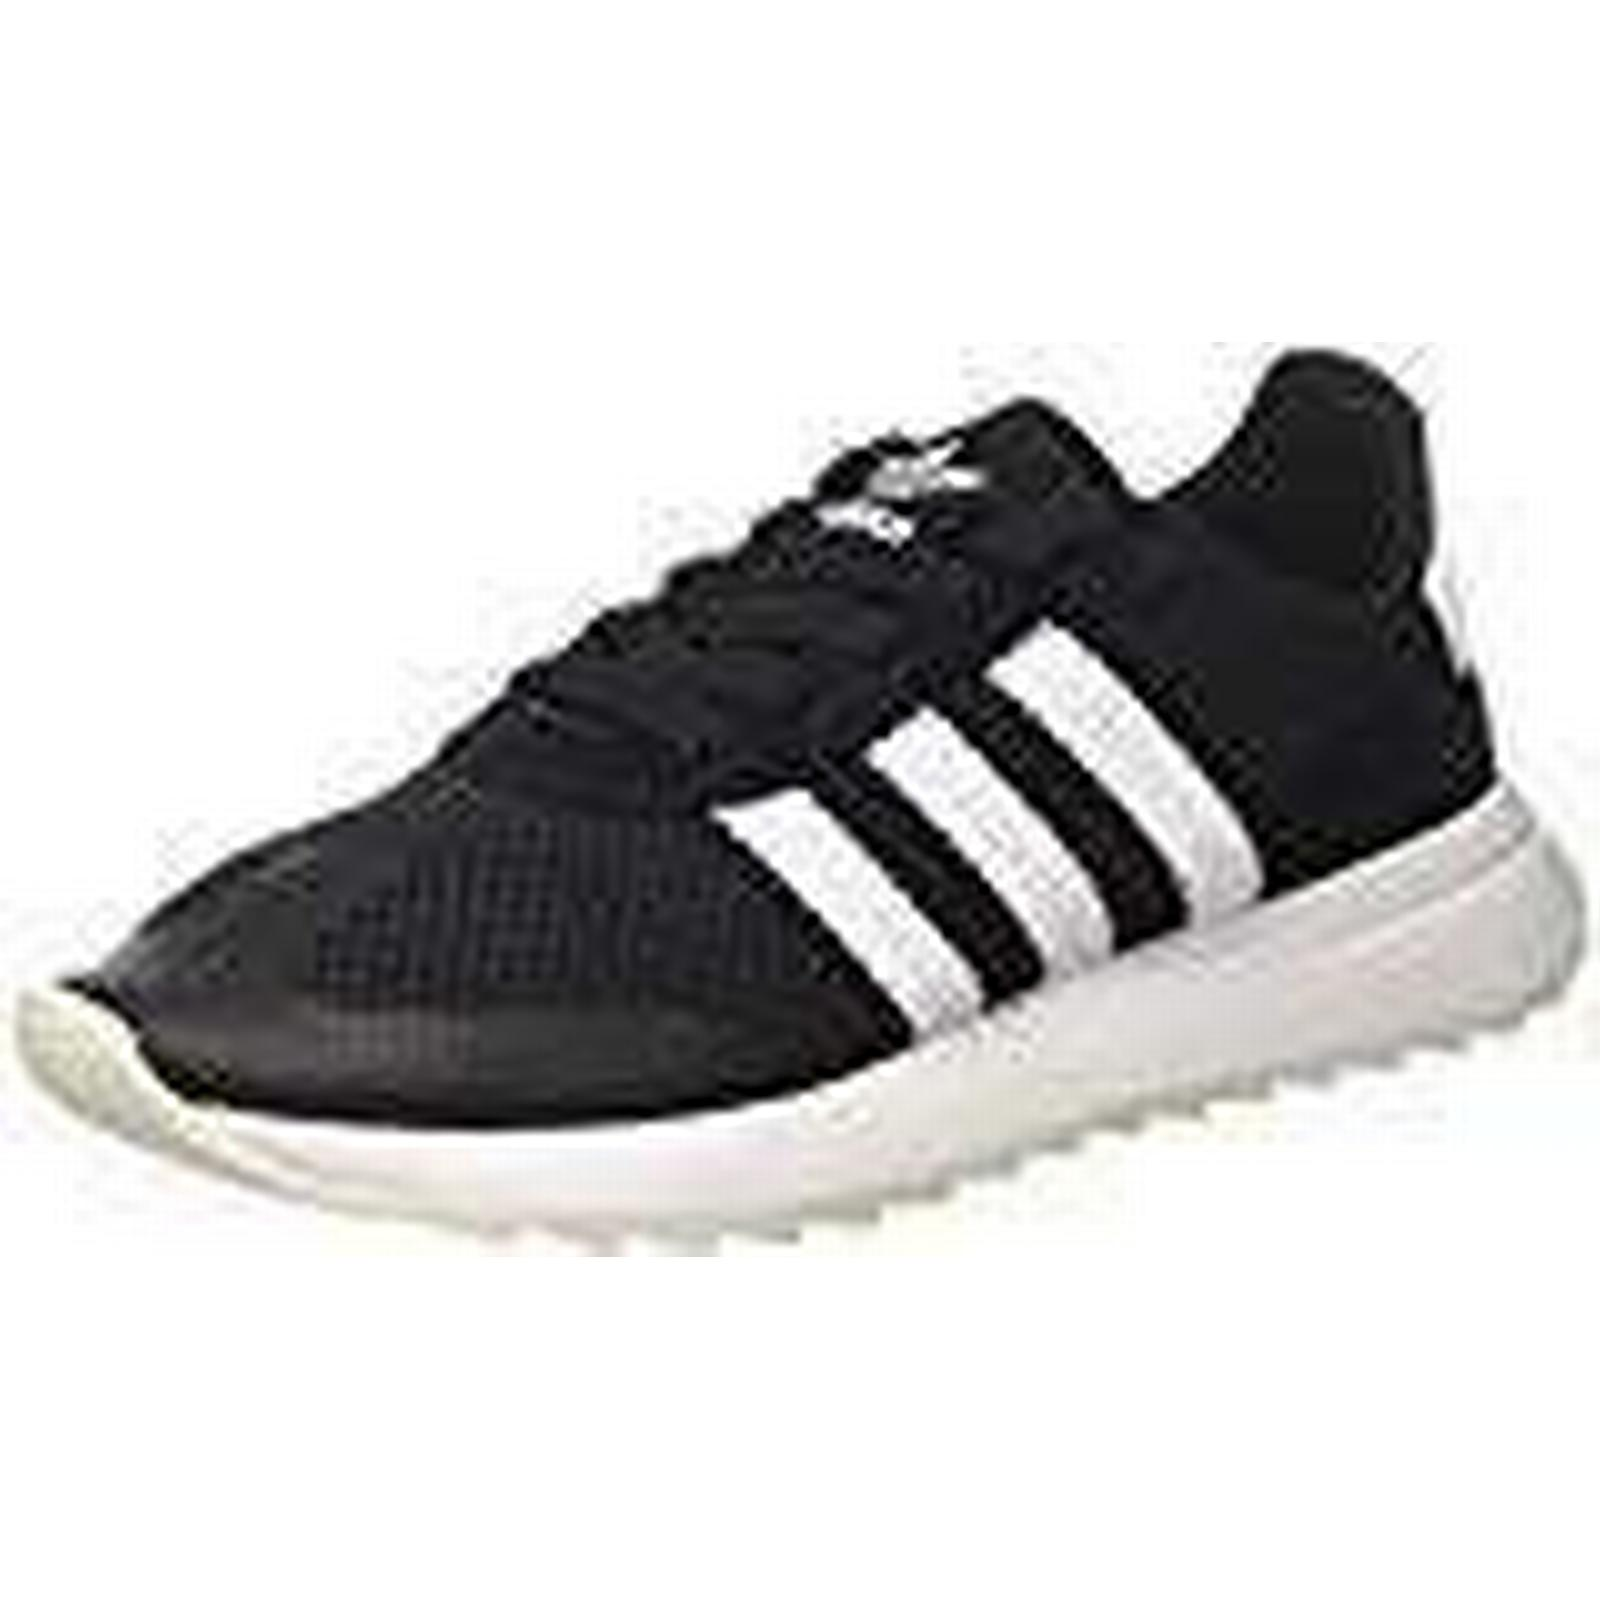 Adidas Women''s FLB W 9 Gymnastics Shoes, FTWR White/core Black, 9 W UK a77cf2